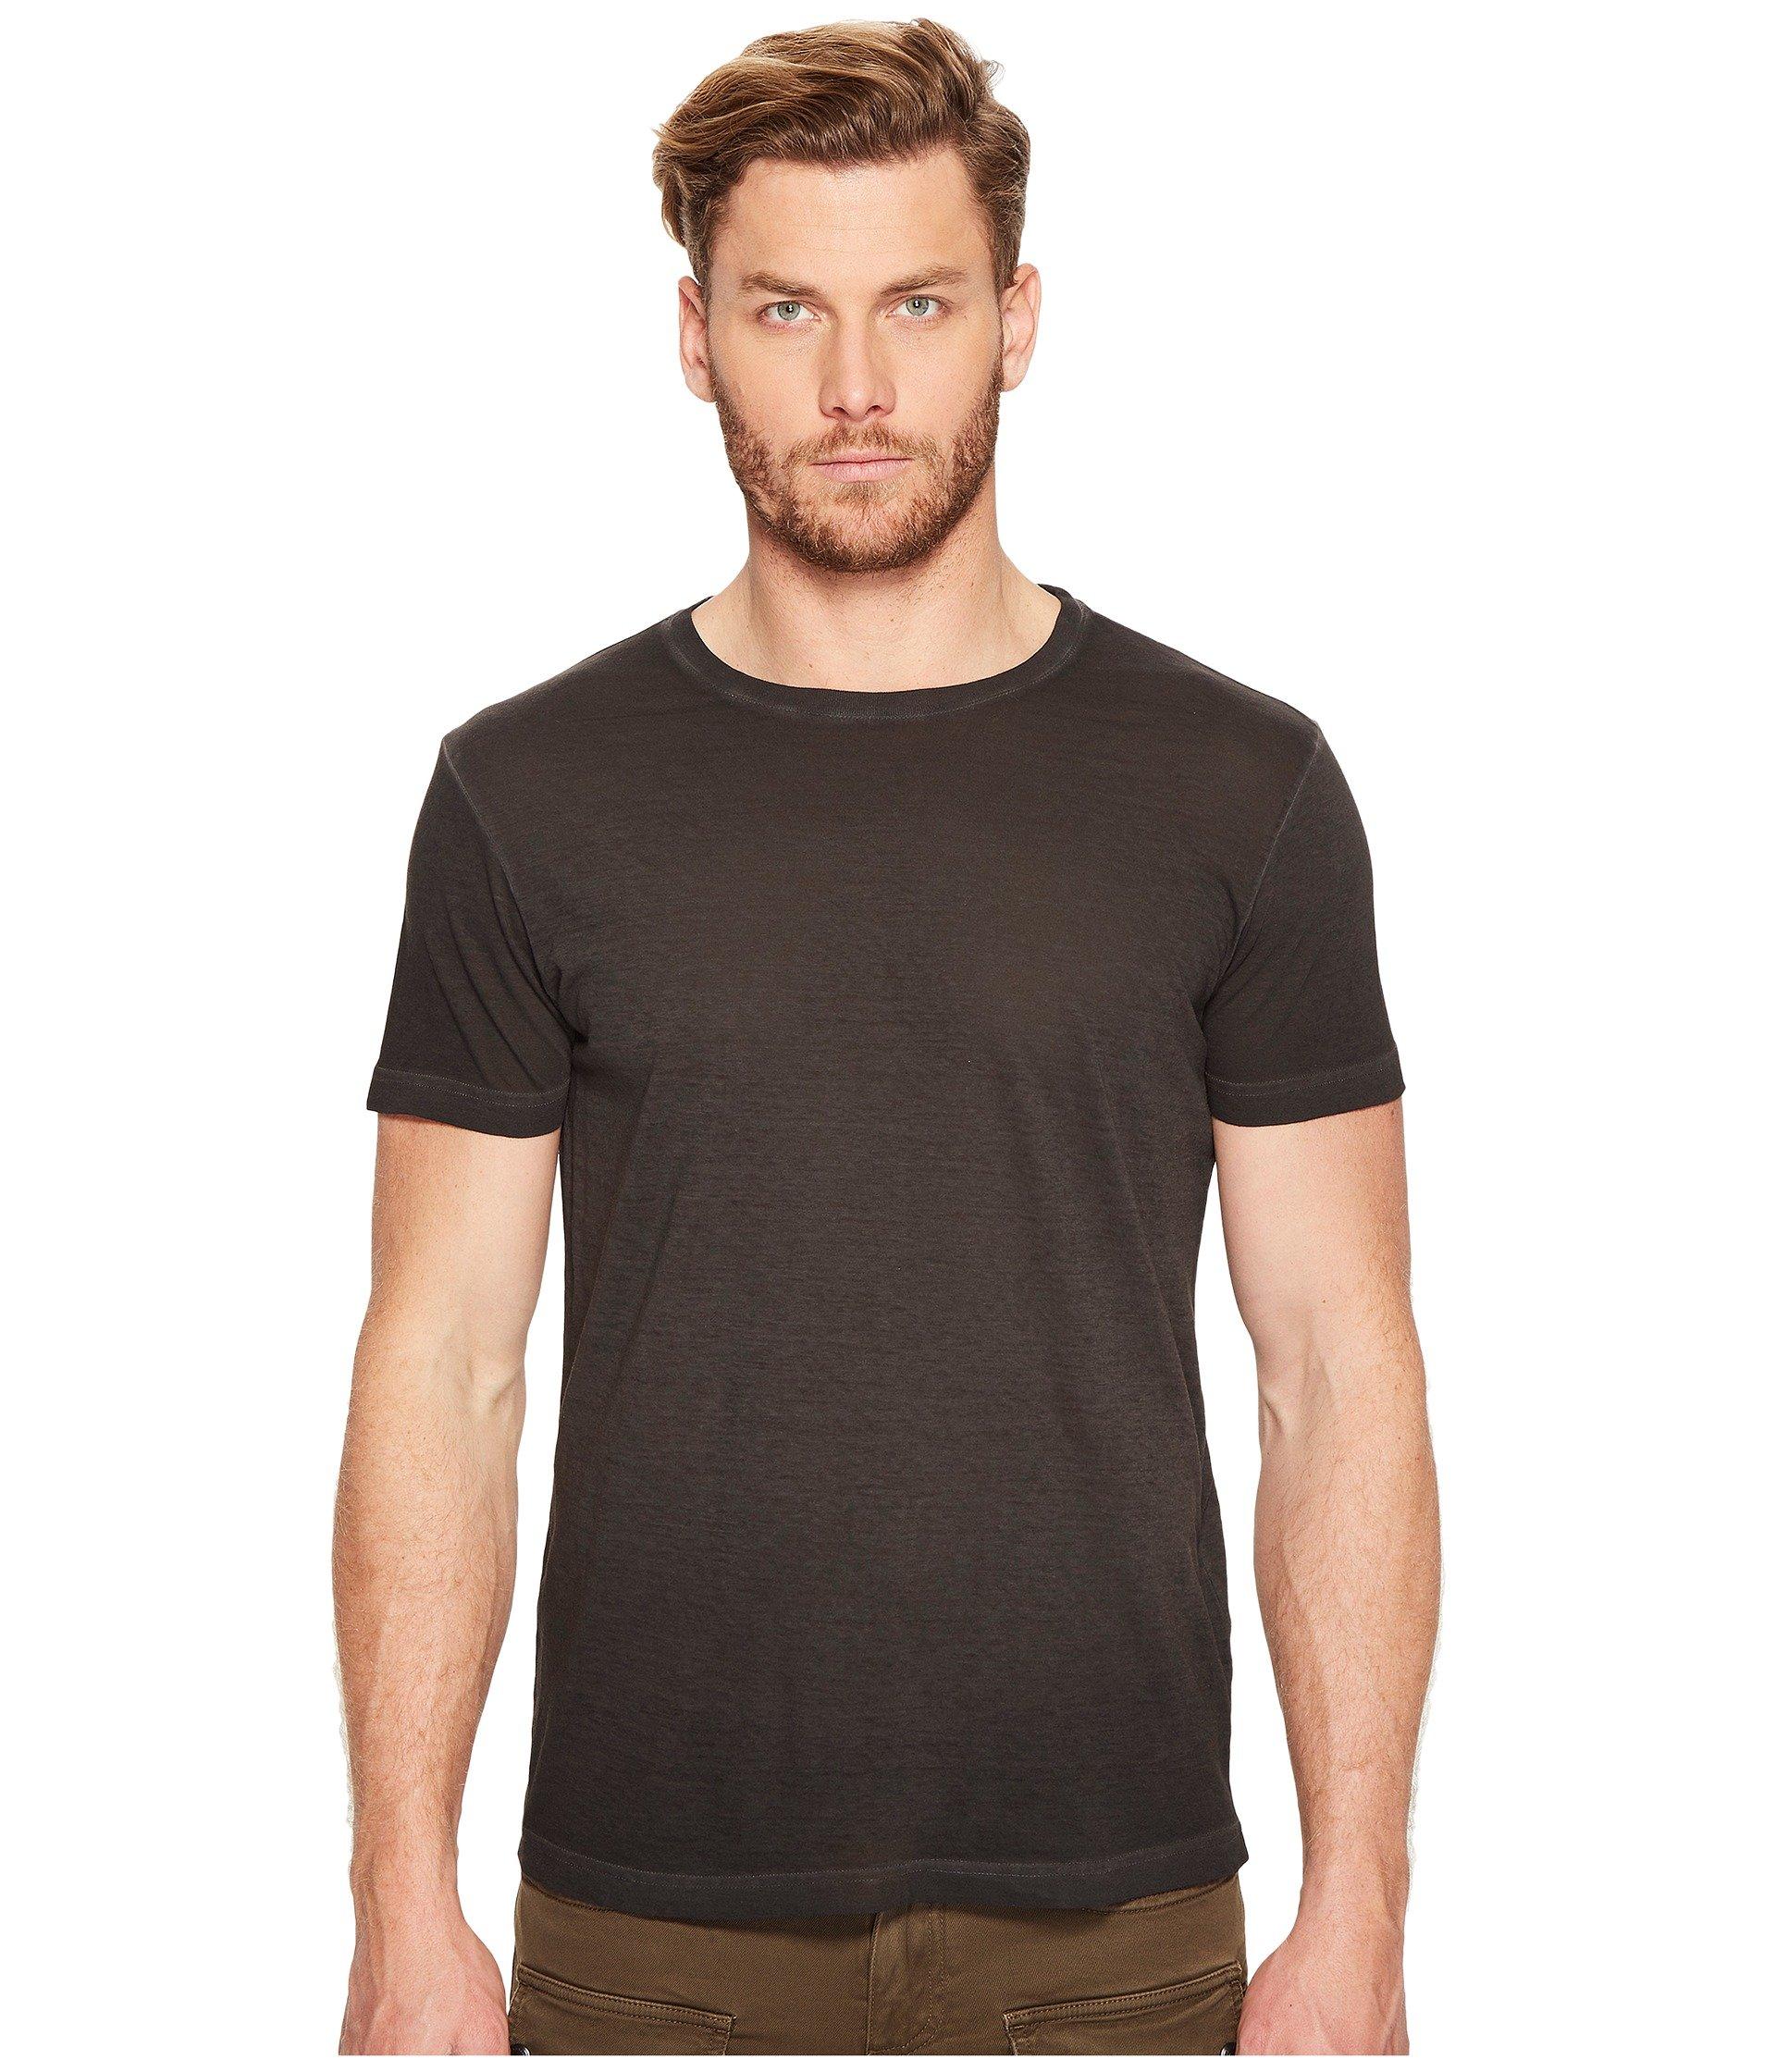 Belstaff Dye T Jersey Black Trafford Cold shirt vE7qxvrw